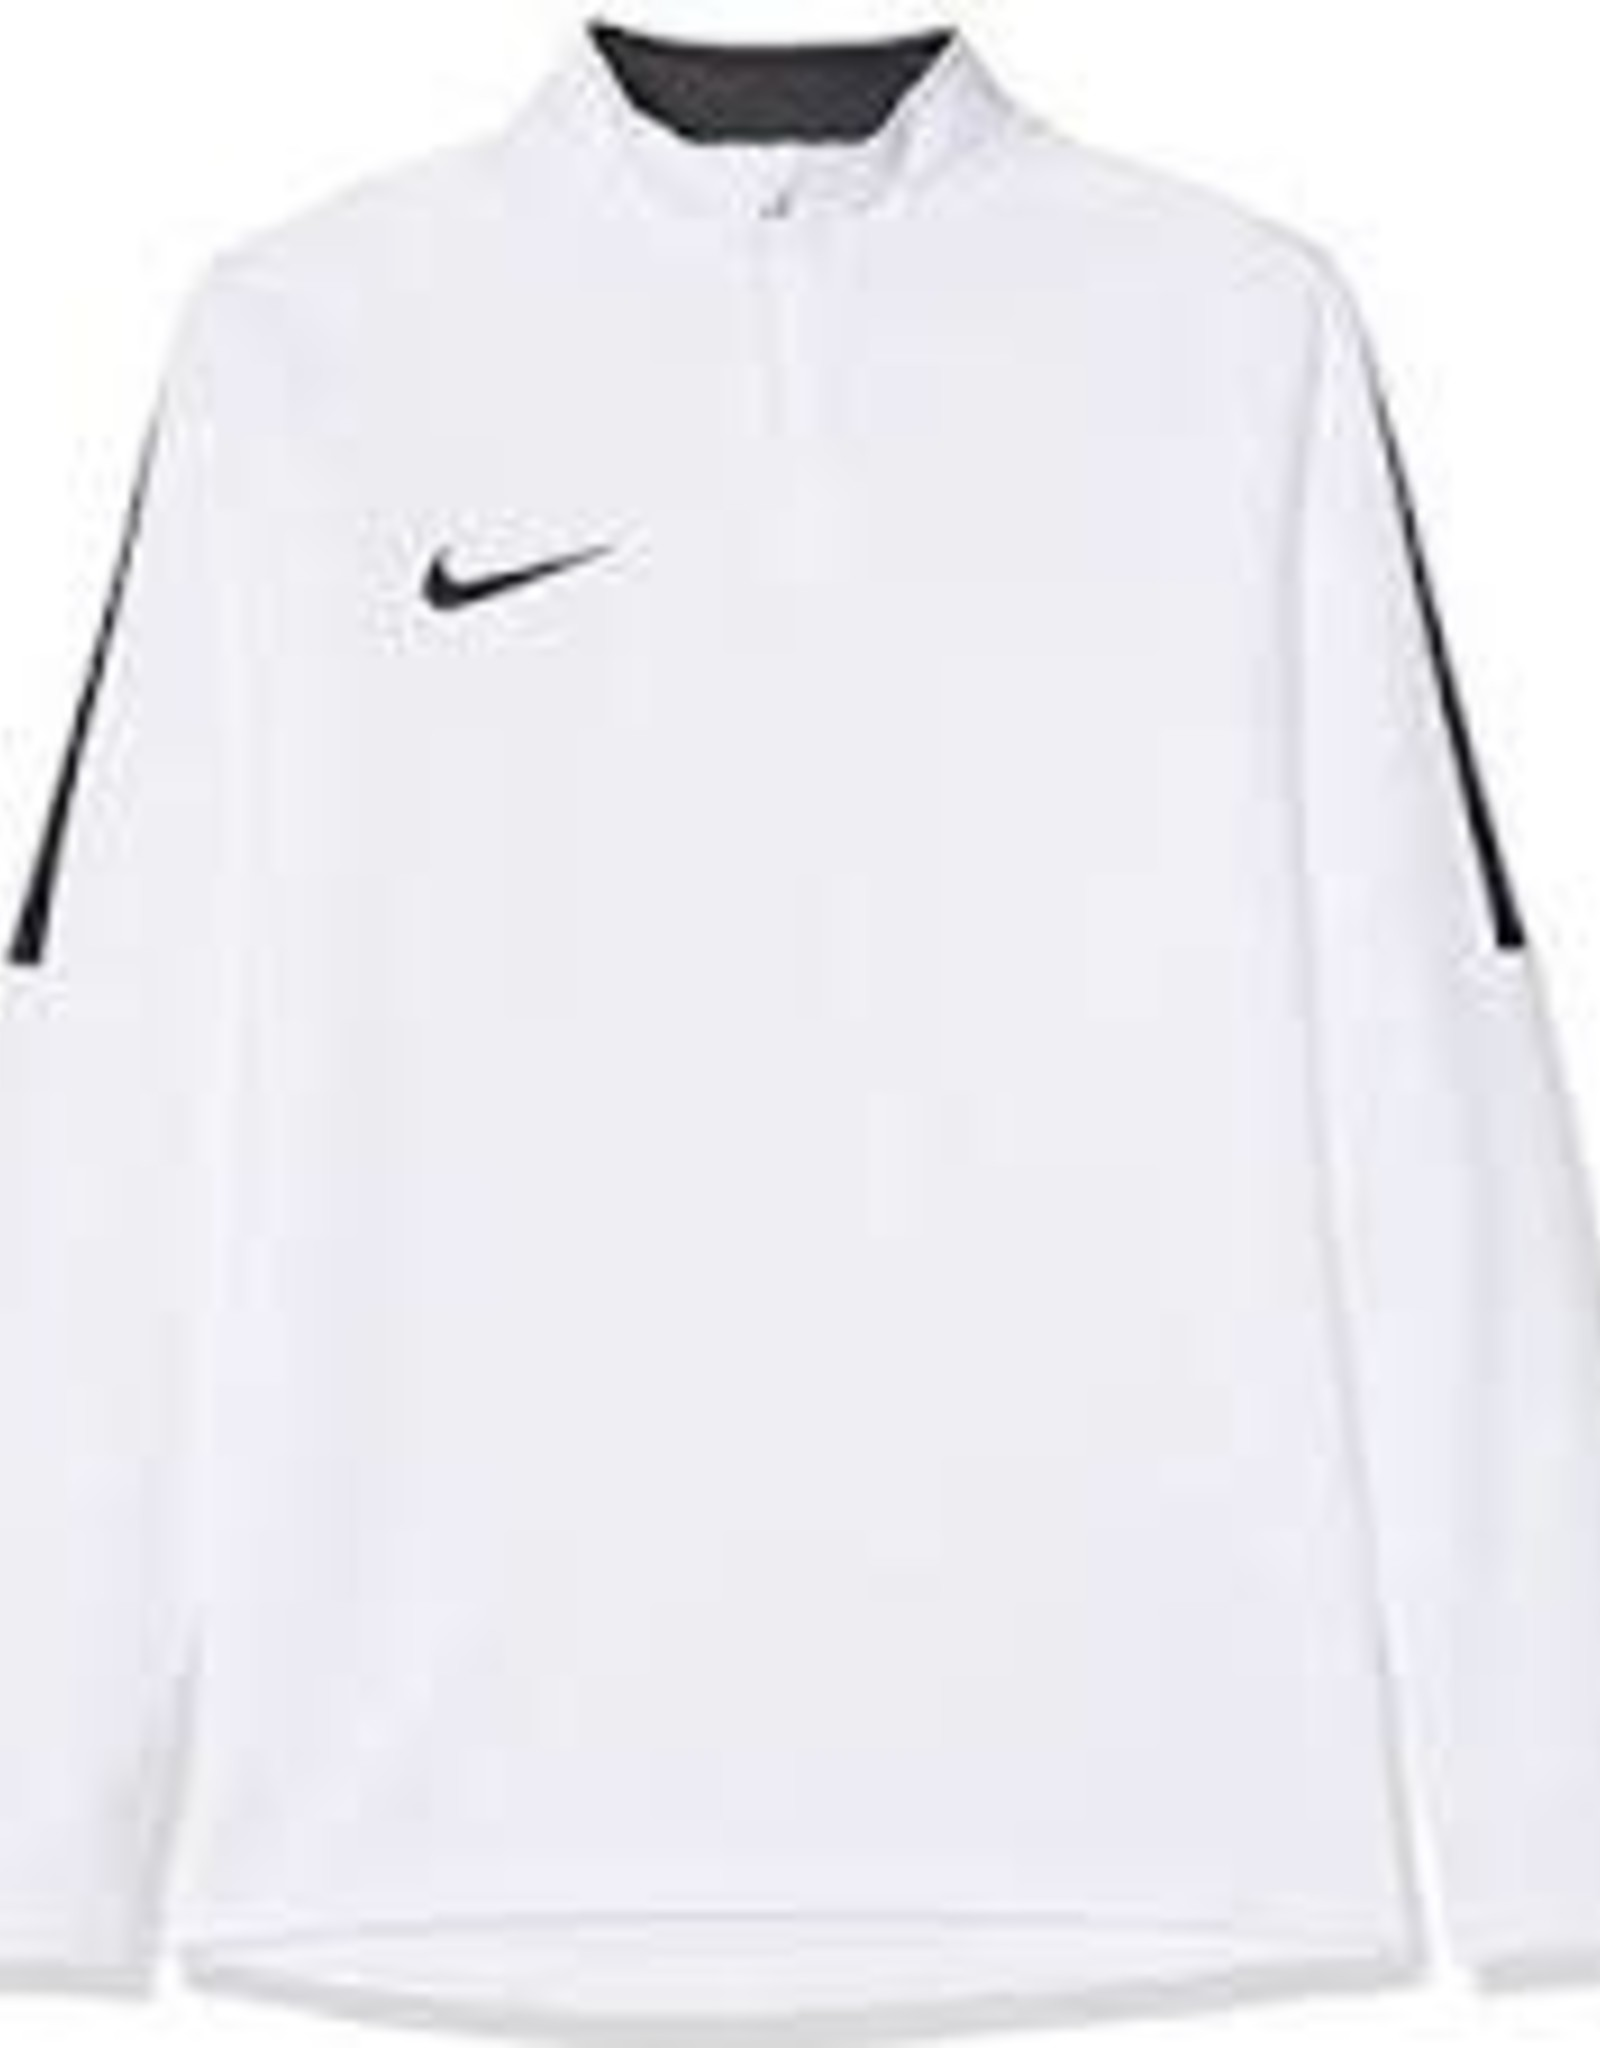 Nike ziptop kids